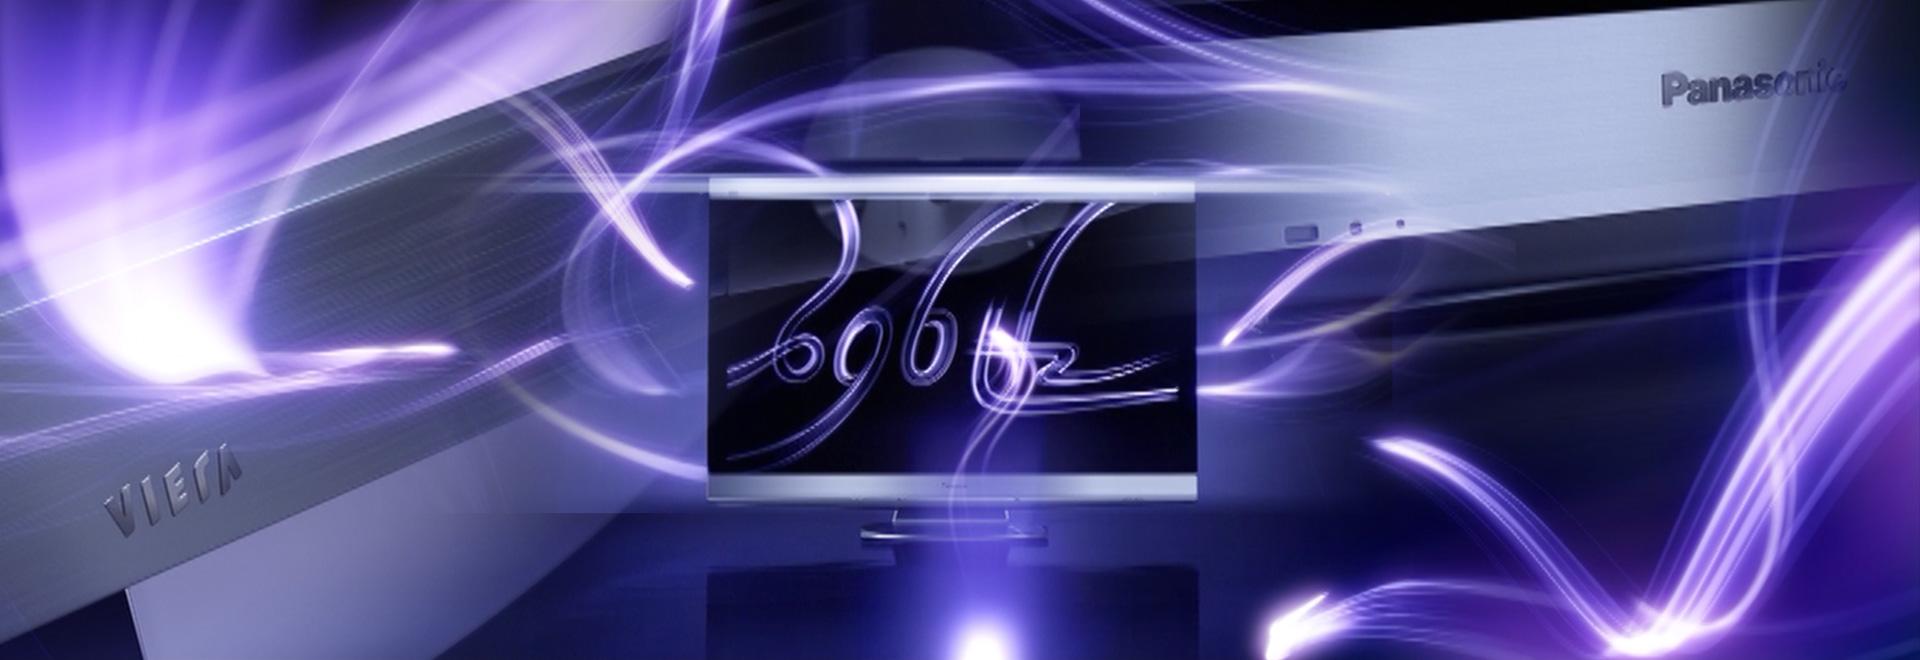 js-filmproduction-postproduction-commercial-panasonic-viera-header